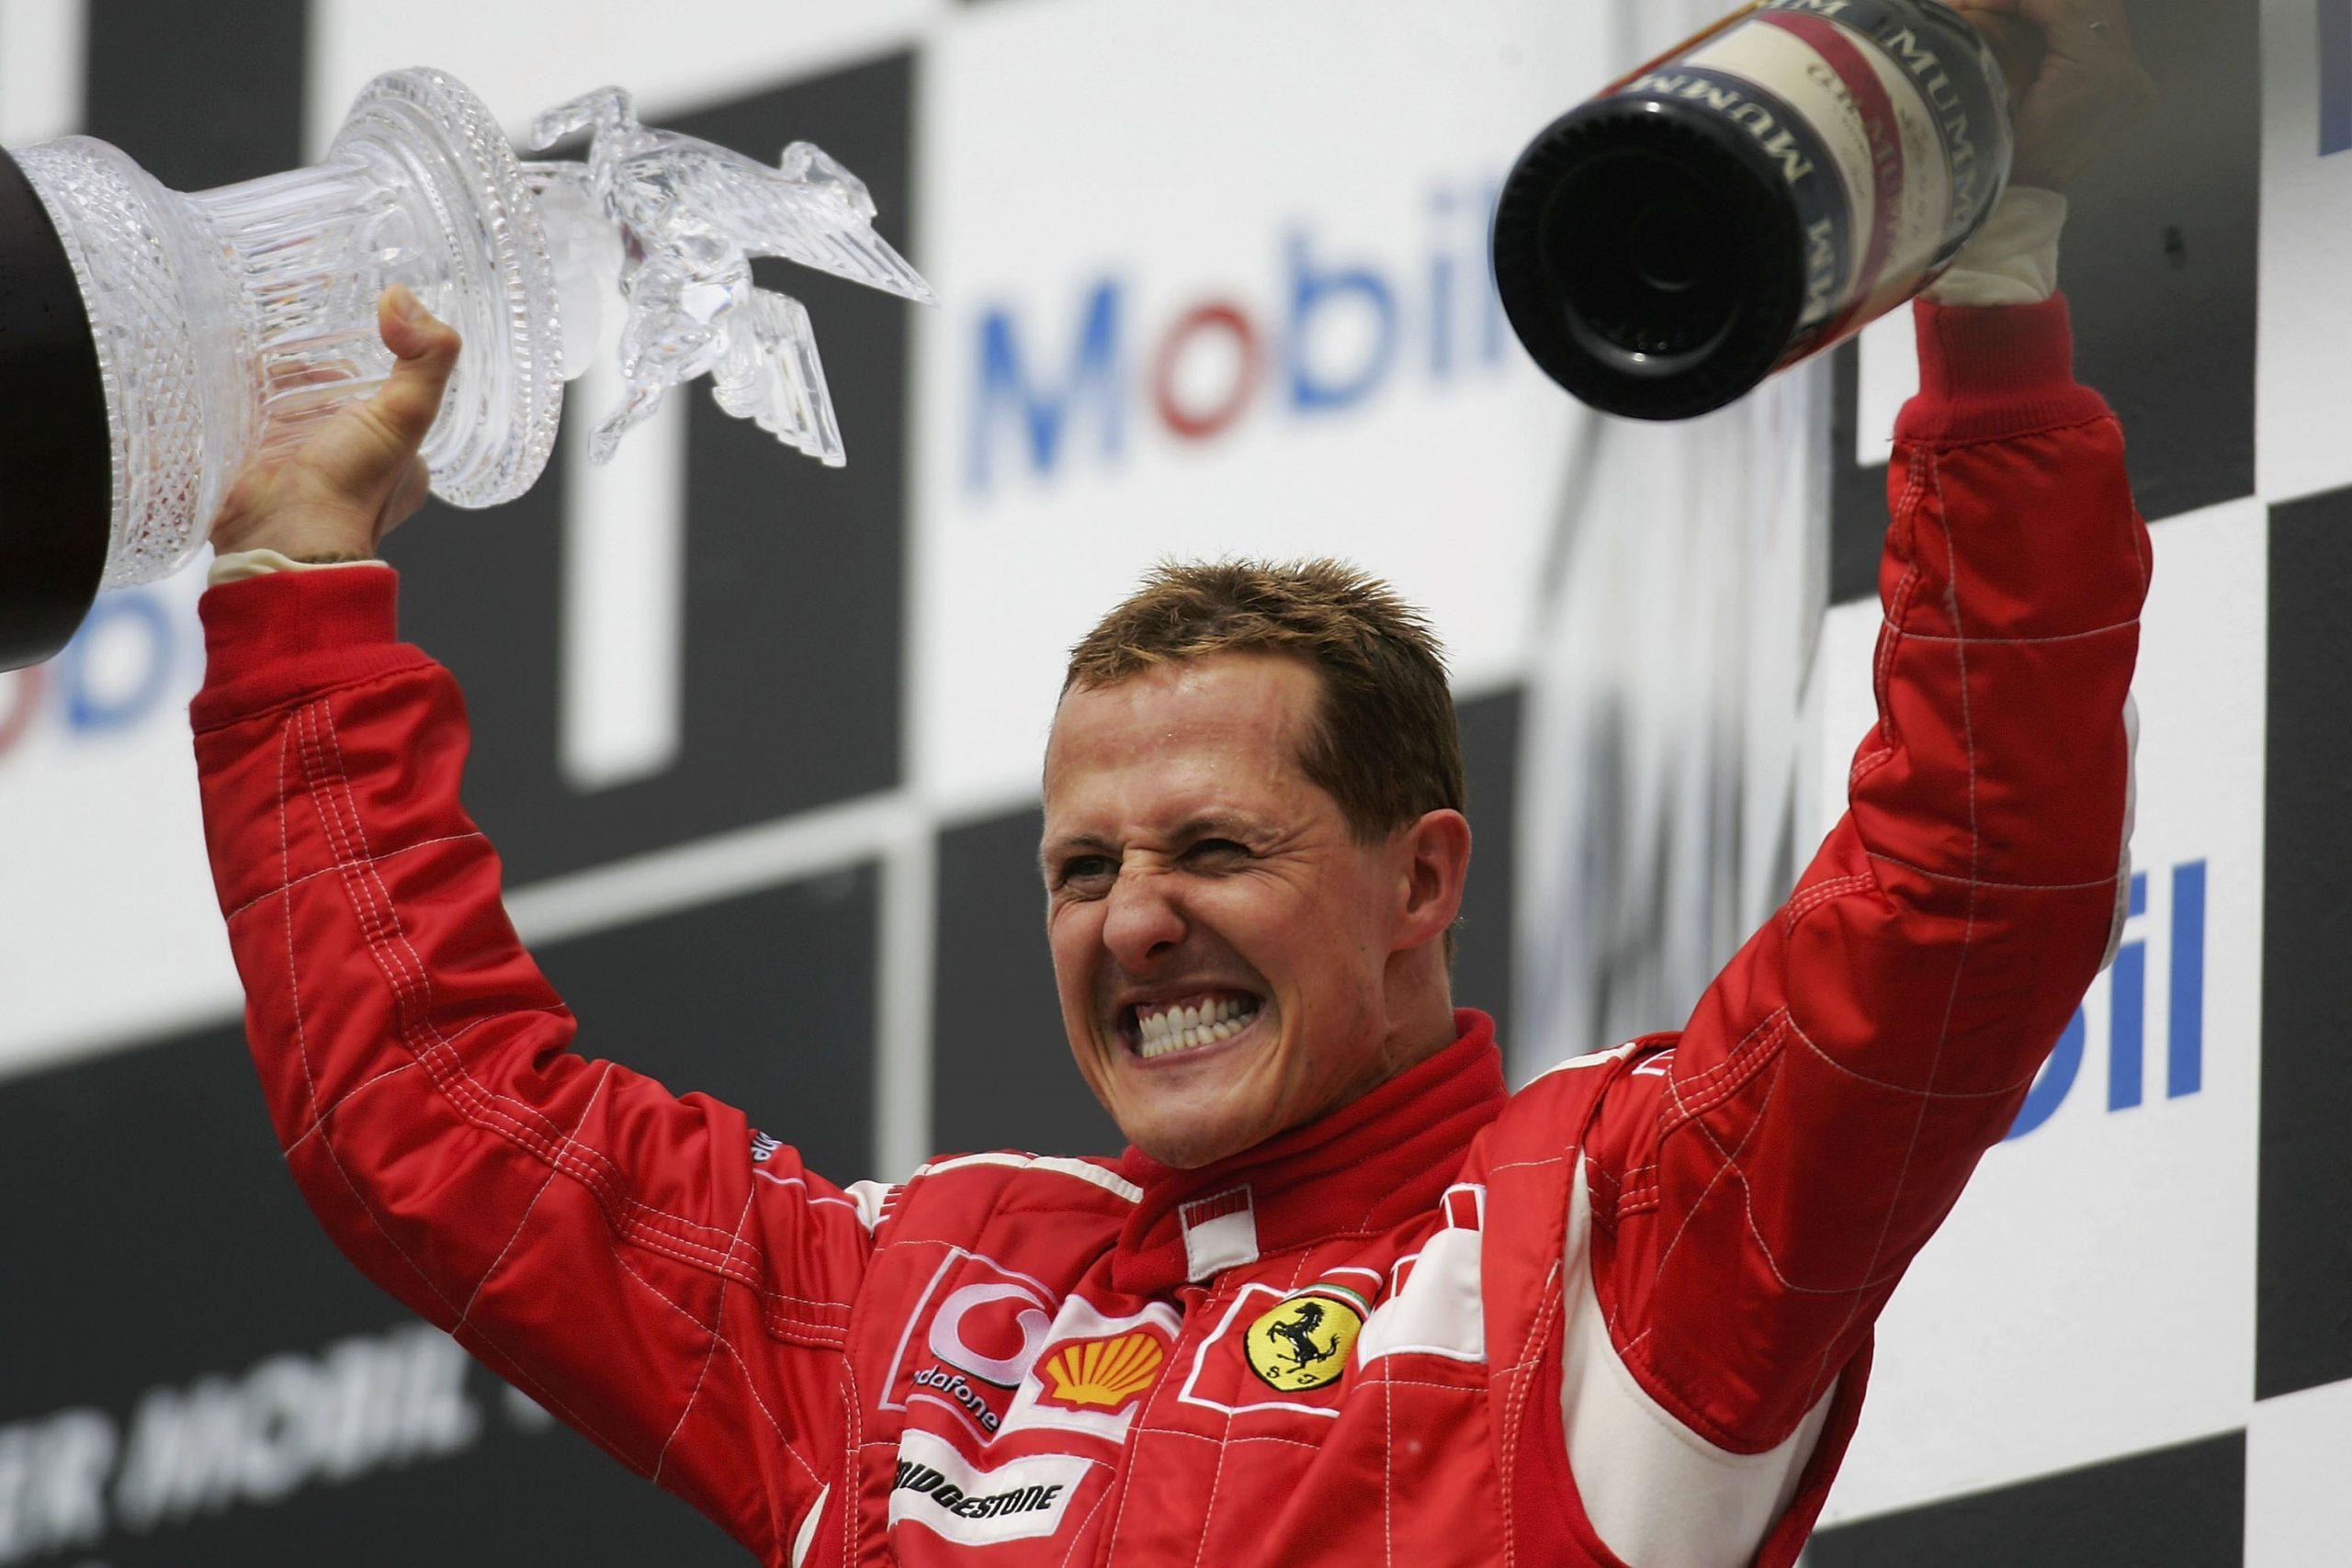 30 years after Michael Schumacher's first F1 Grand Prix, Netflix puts a spotlight on the racing legend